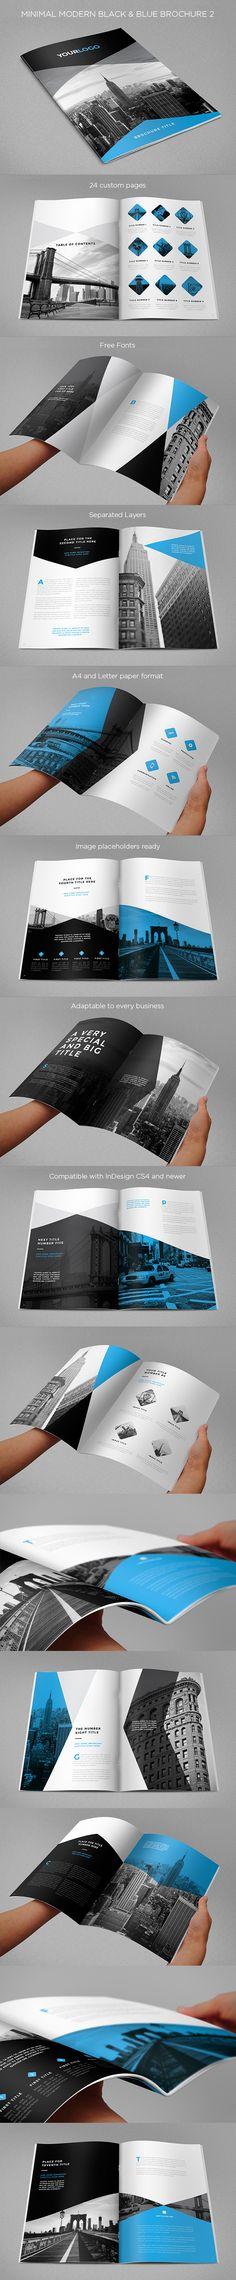 Minimal Modern Black & Blue Brochure 2. Download here: http://graphicriver.net/item/minimal-modern-black-blue-brochure-2/13640559?ref=abradesign